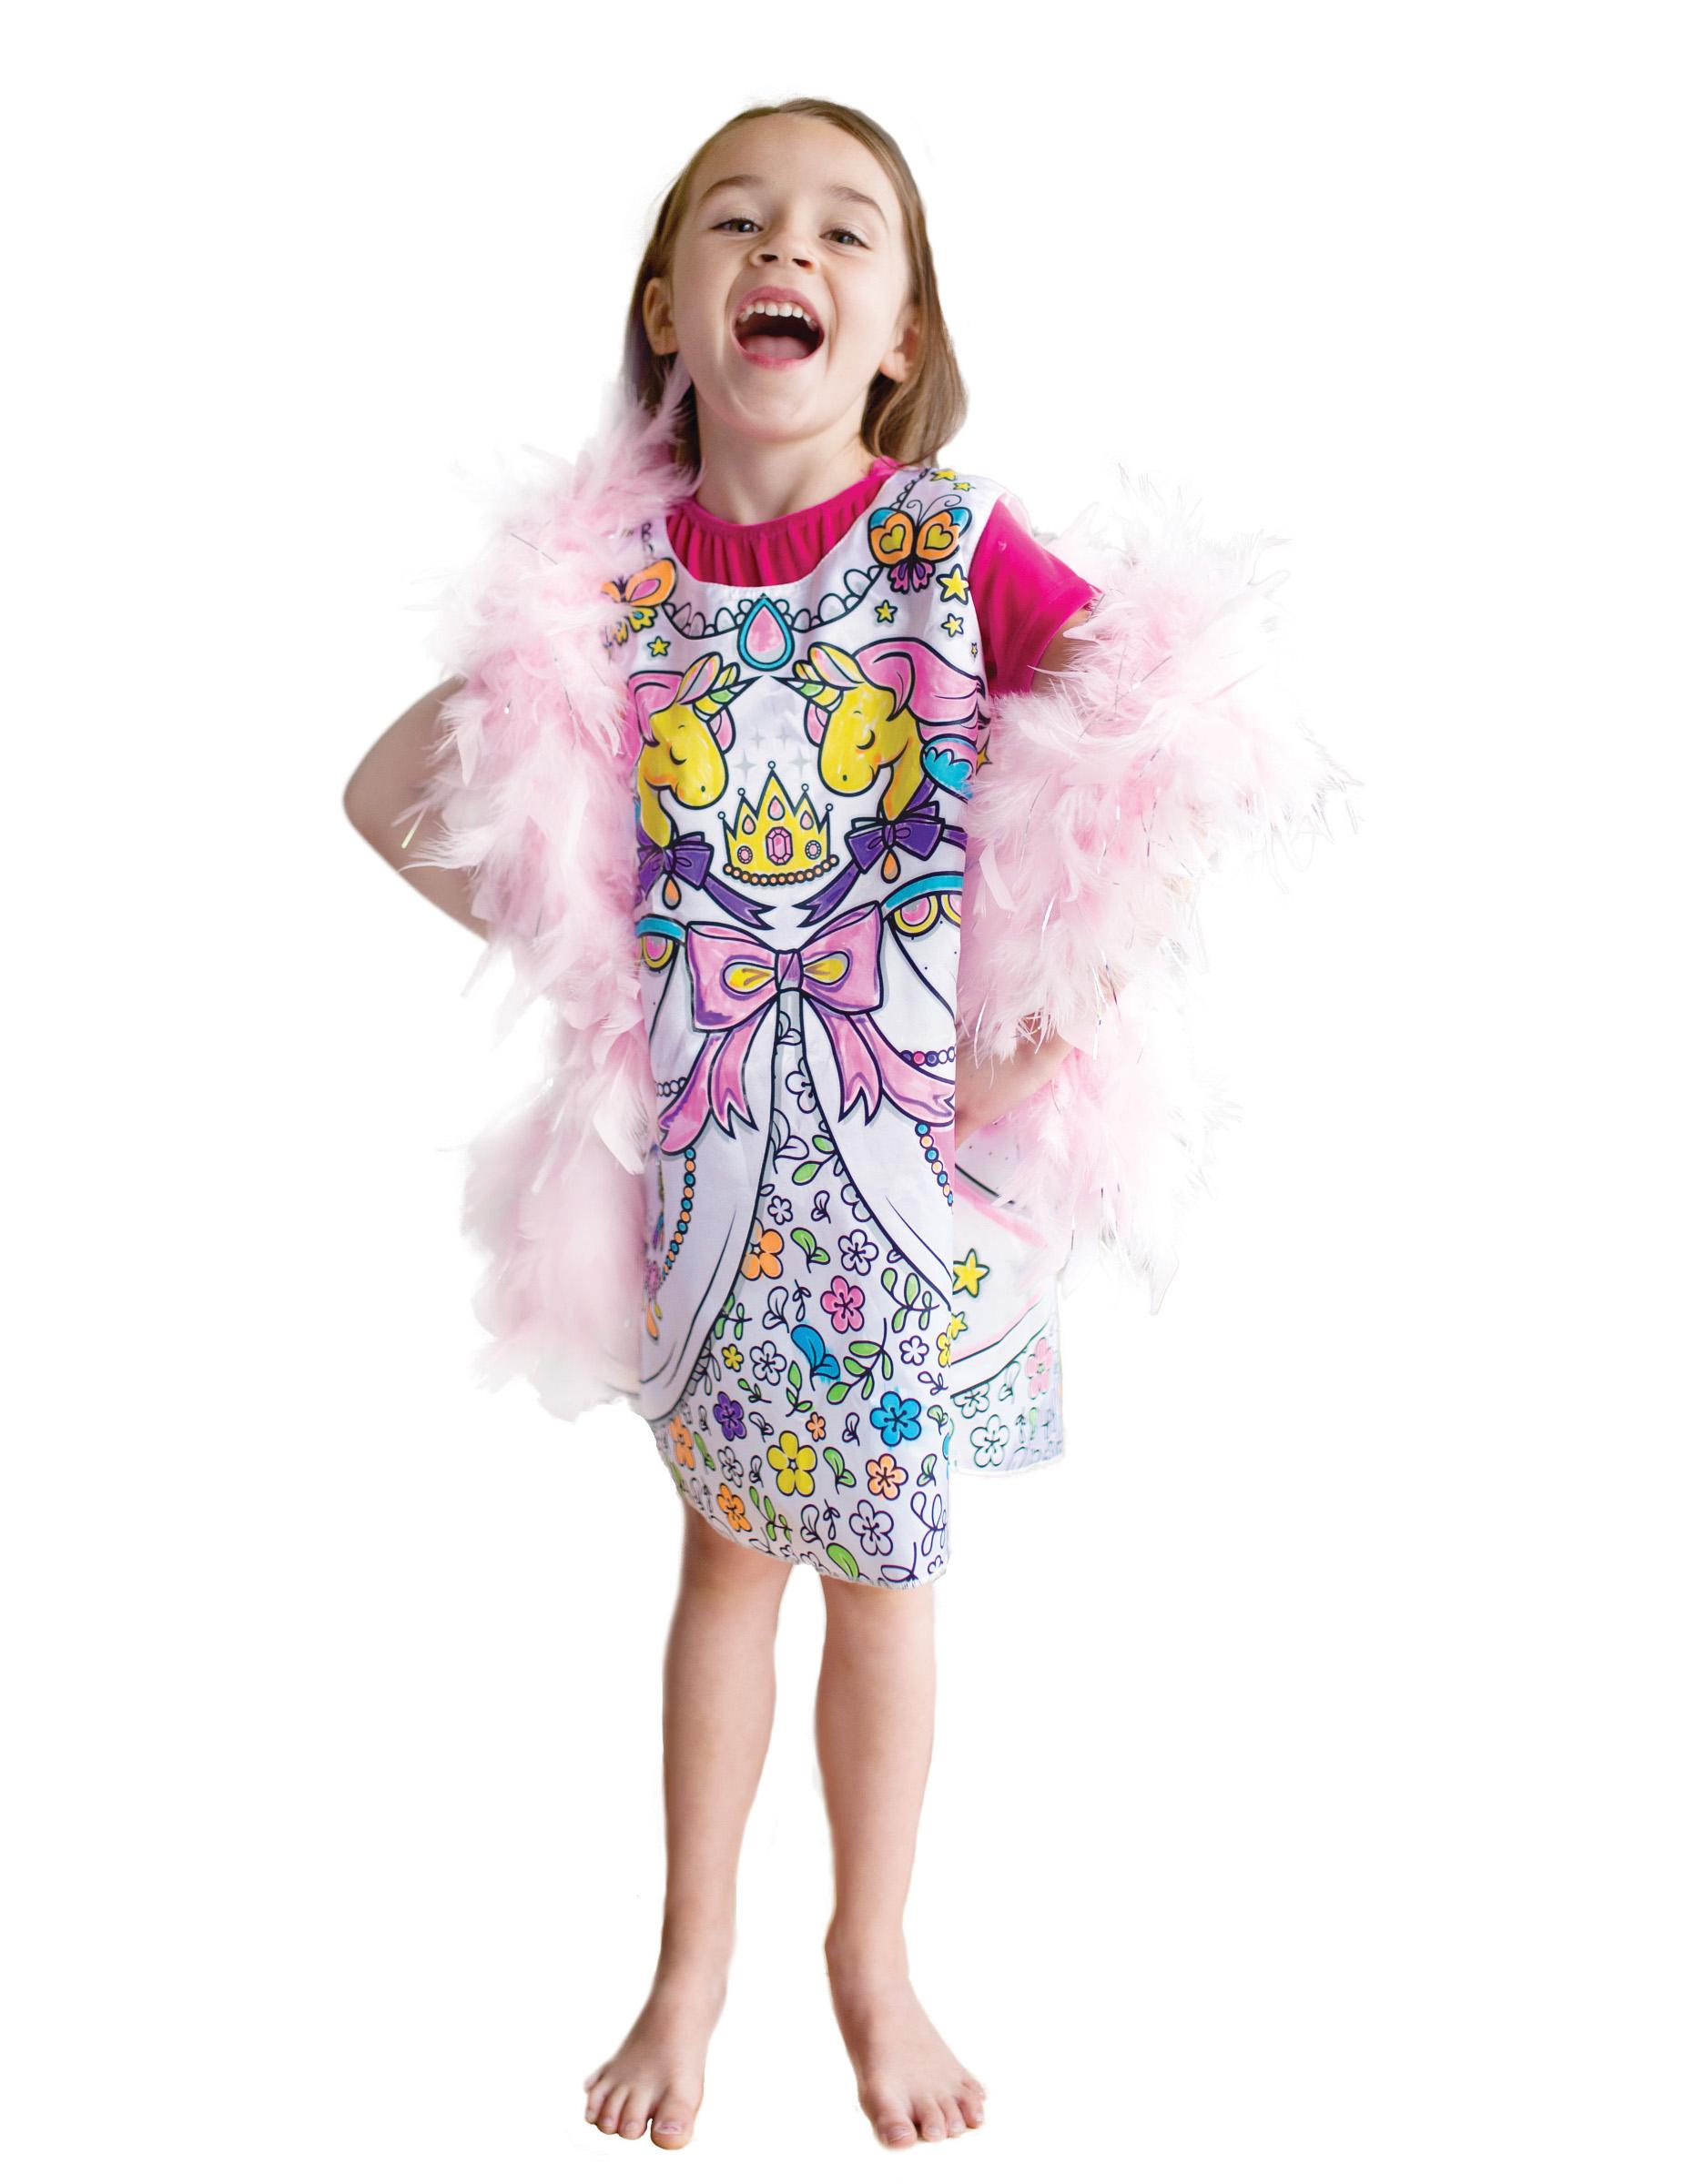 Vestita Carnevale Bambina Vestita Vestita Carnevale Vecchia Da Vecchia Bambina Da Bambina zVpMSUqG